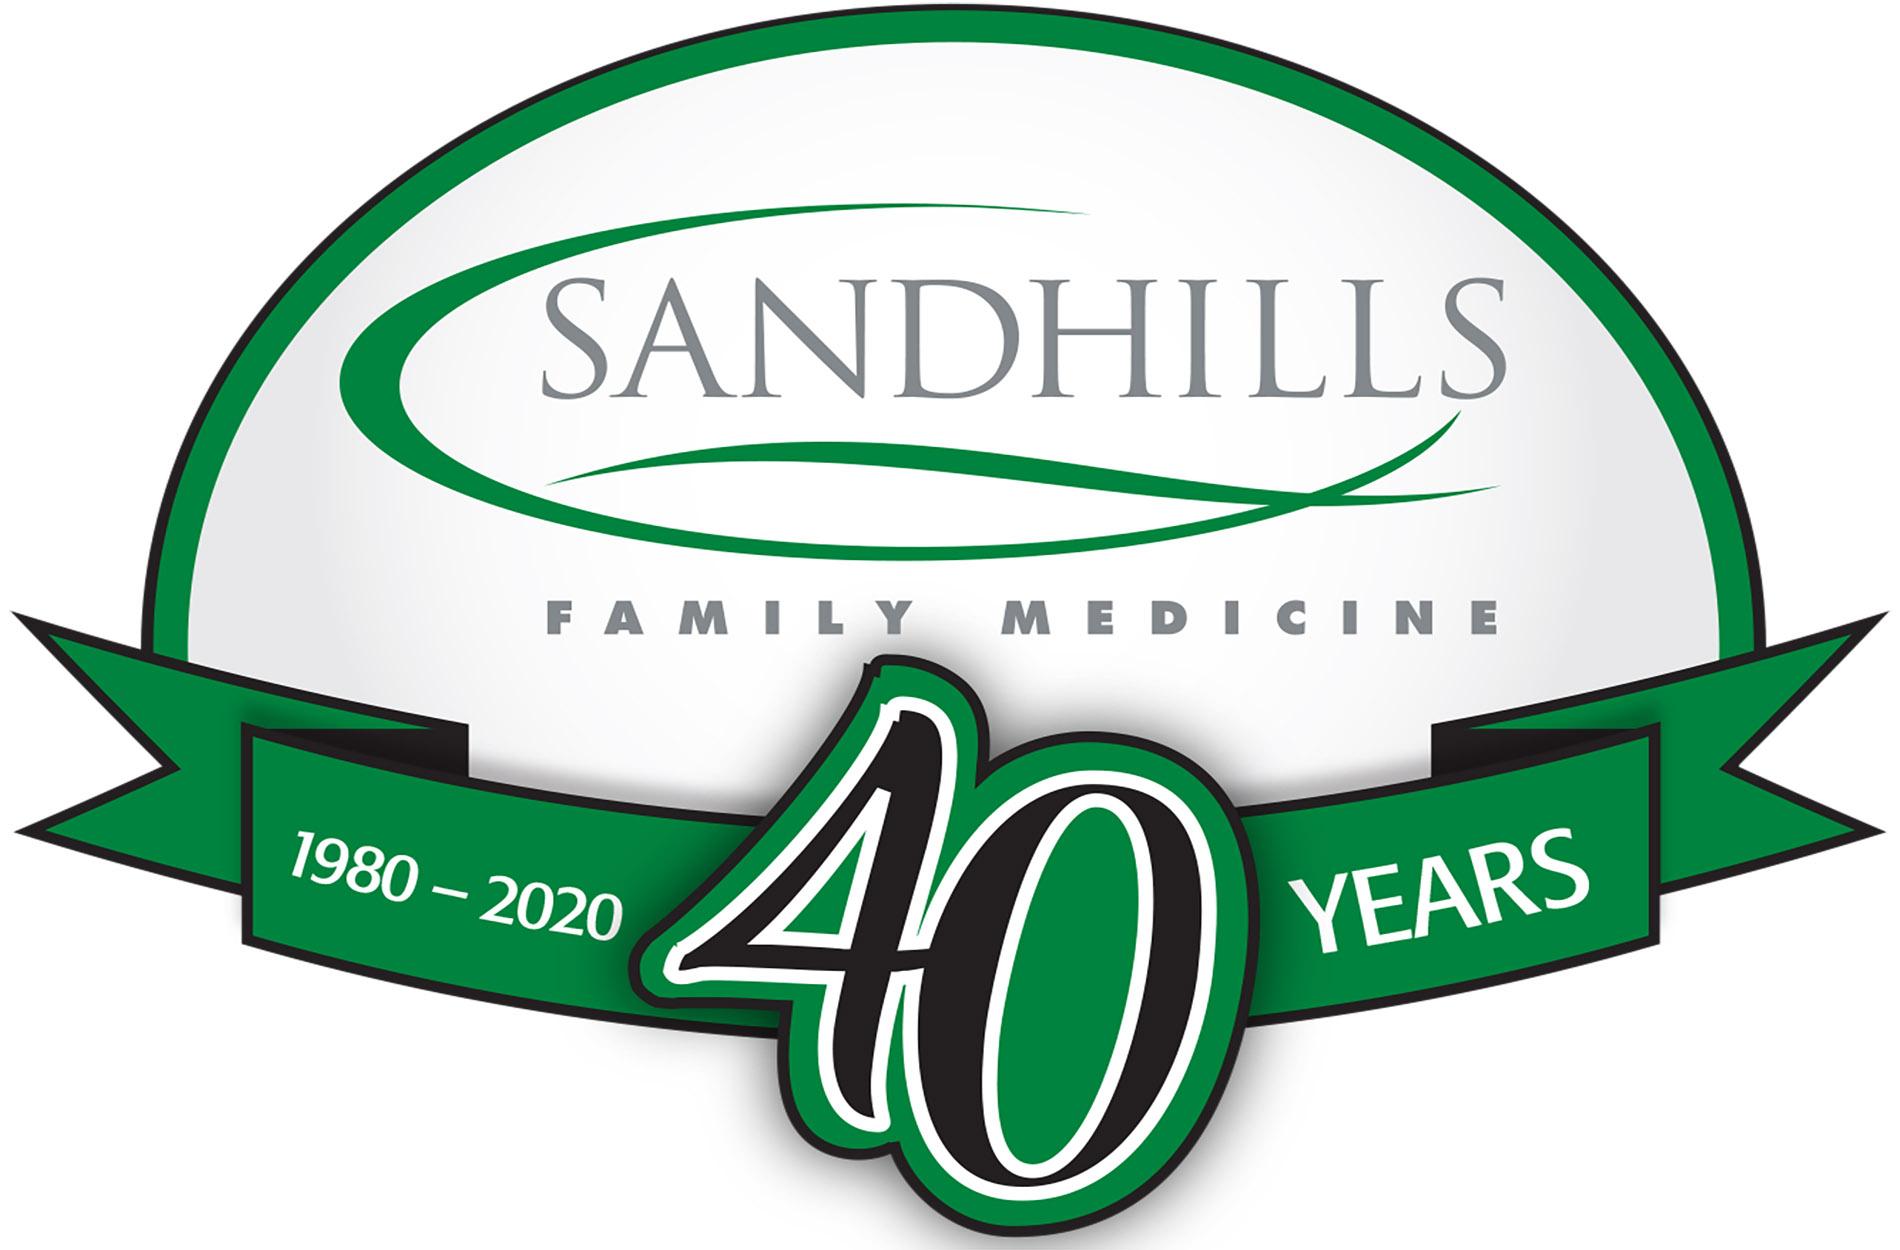 Sandhills Family Medicine 40th anniversary logo